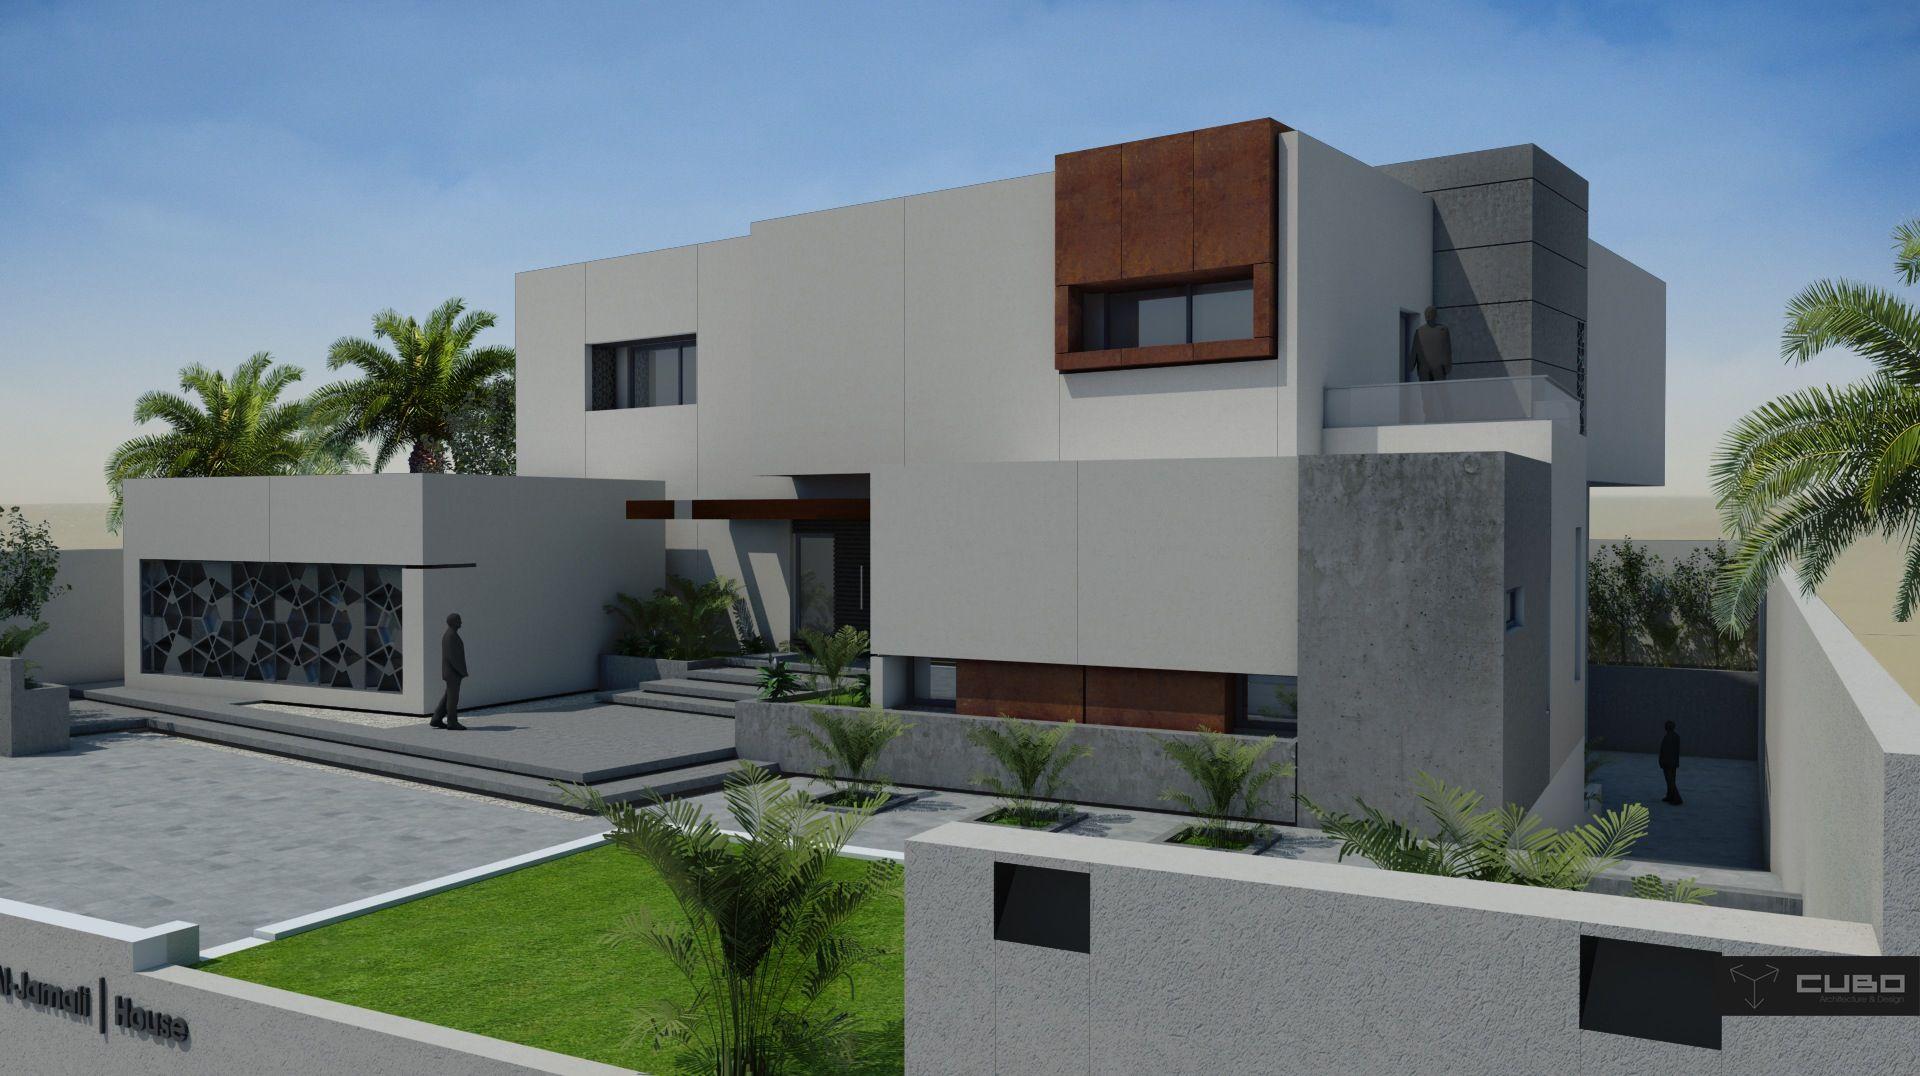 Modern house in doha qatar design by cubo